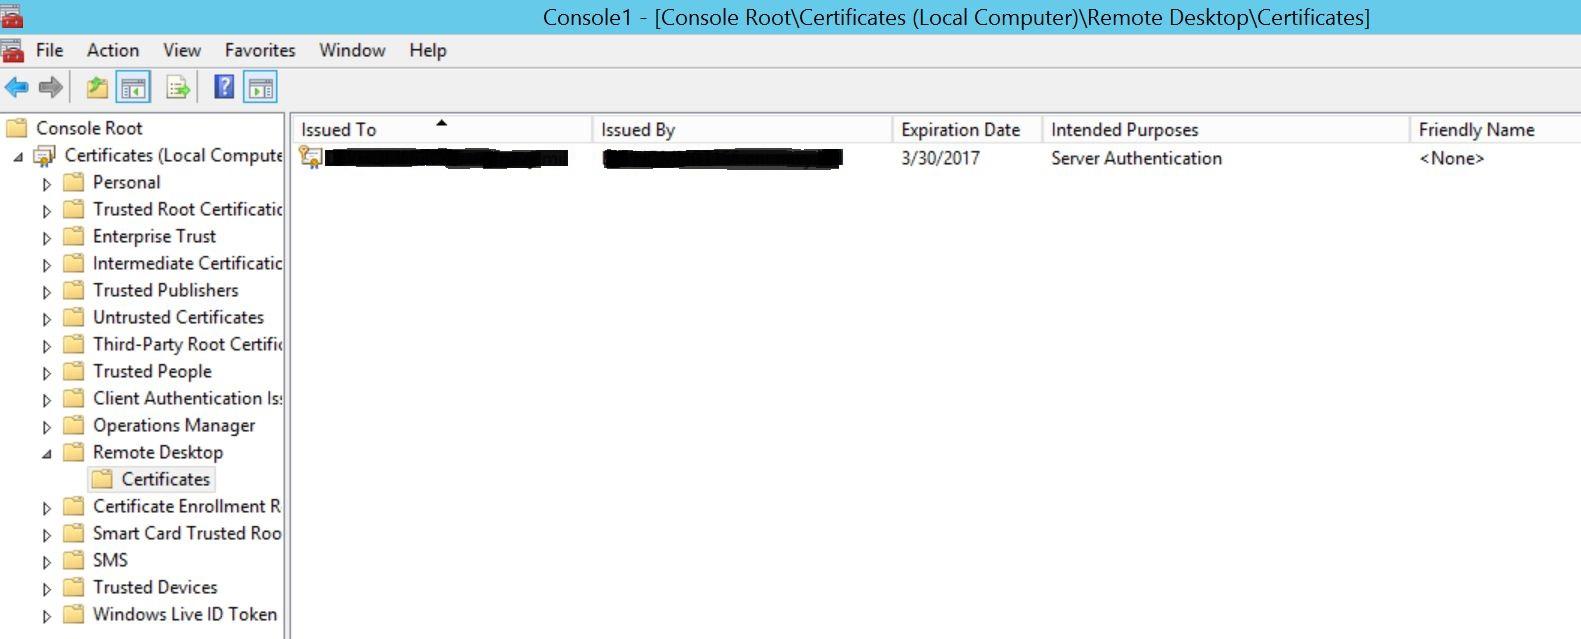 Self Signed Cert In The Remote Desktop Cert Store